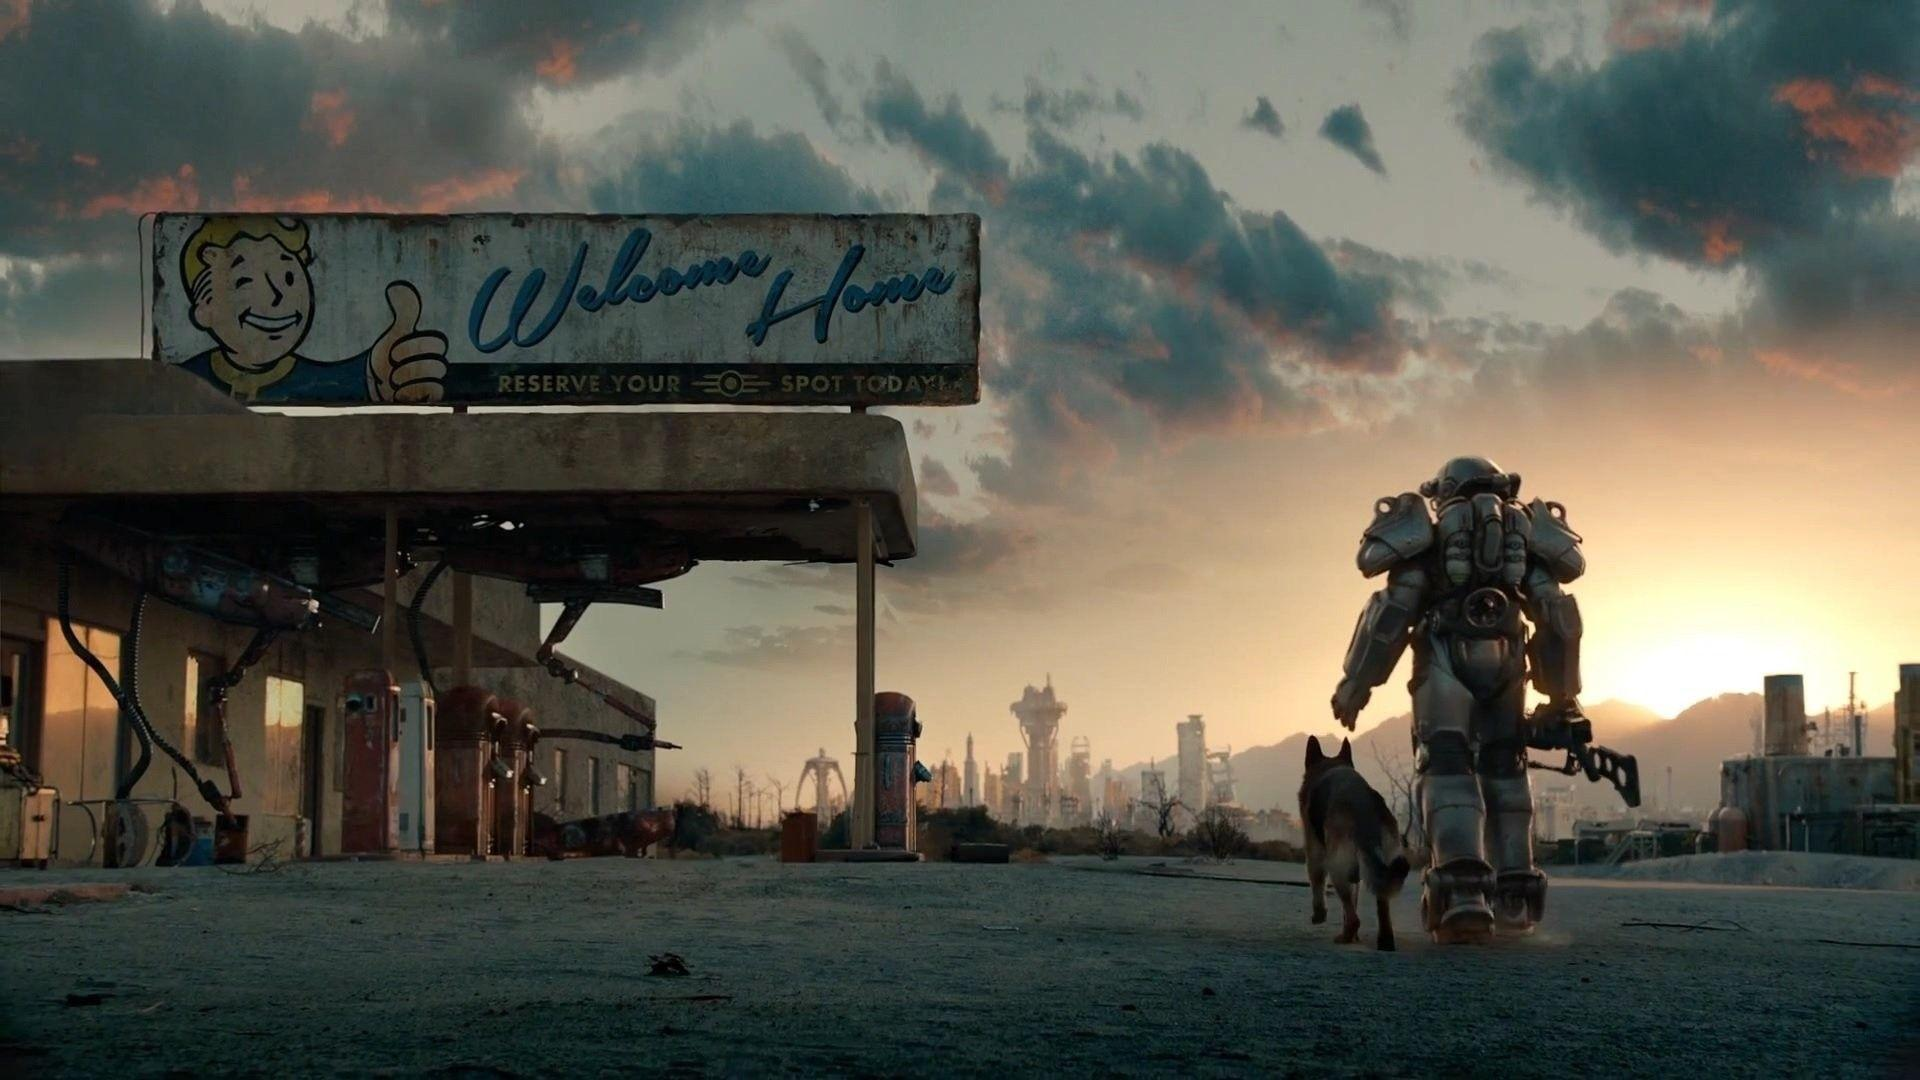 Unique Fallout 76 Wallpaper